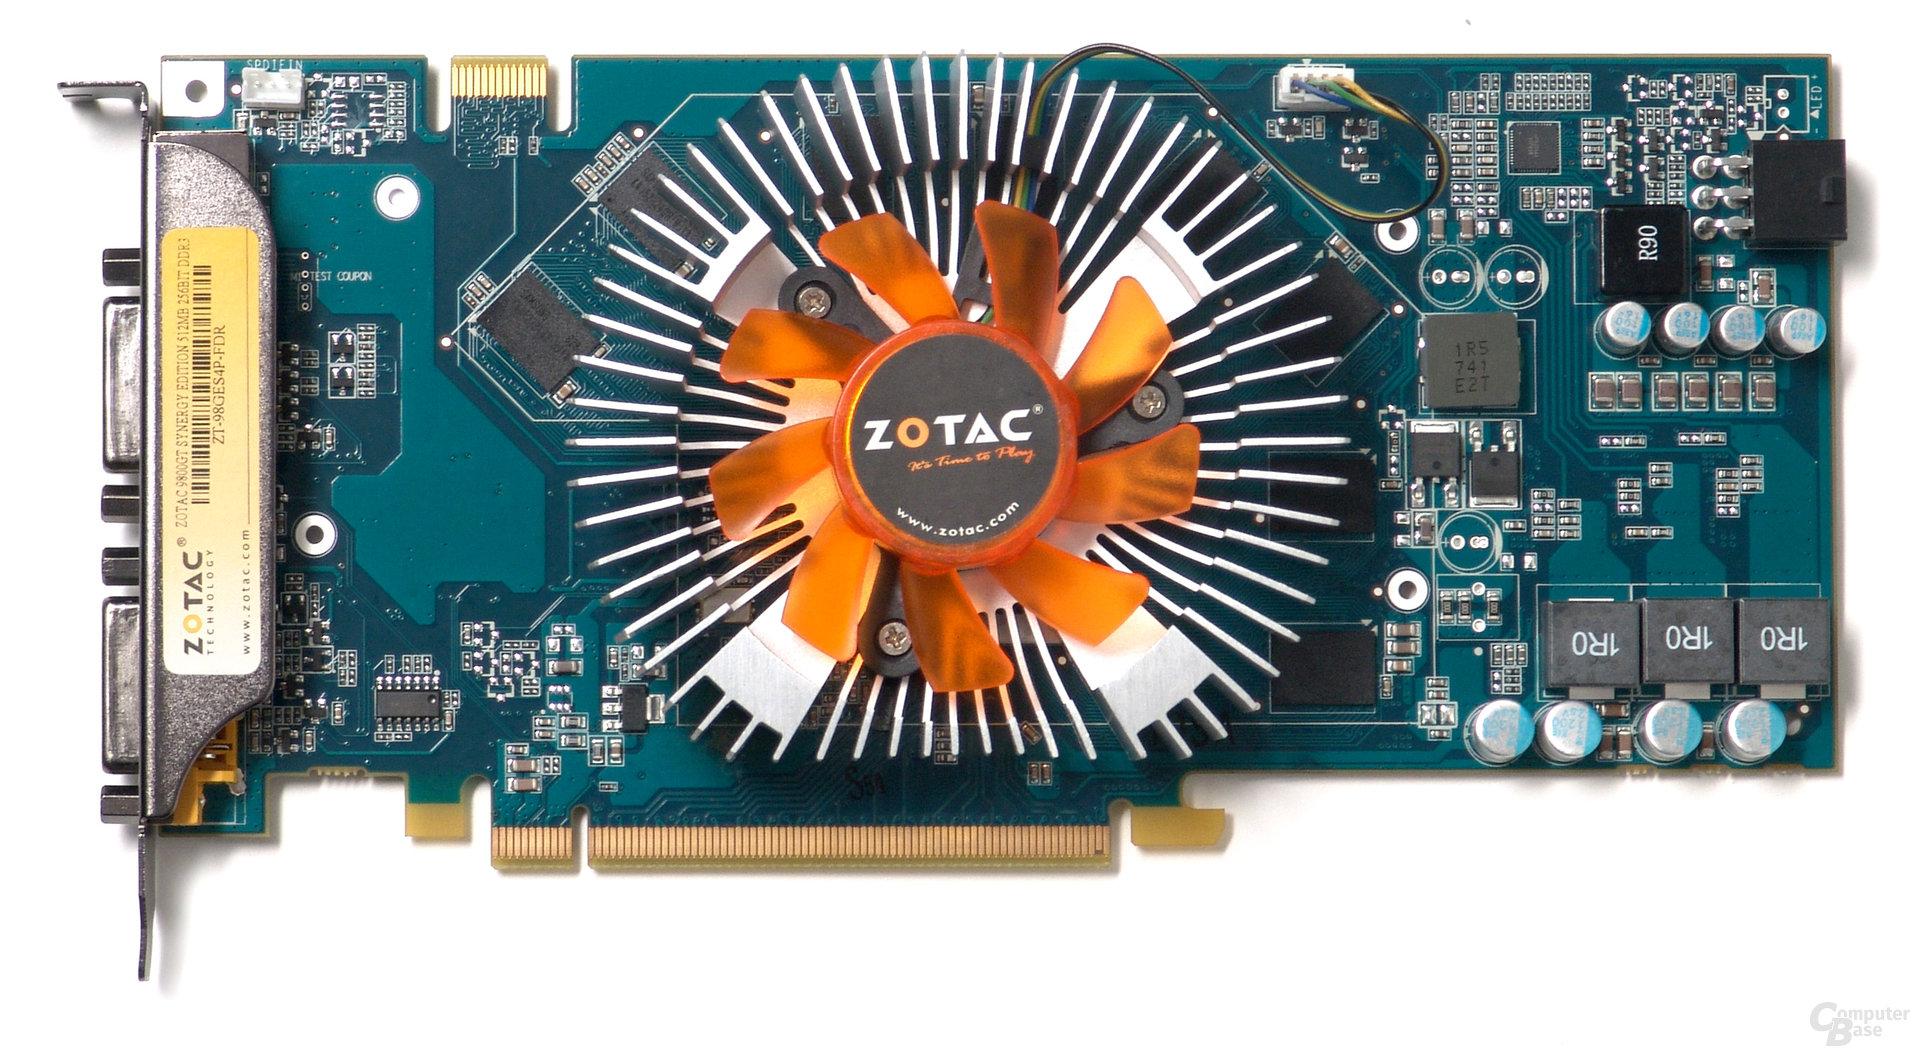 Zotac GeForce Synergy 9800 GT